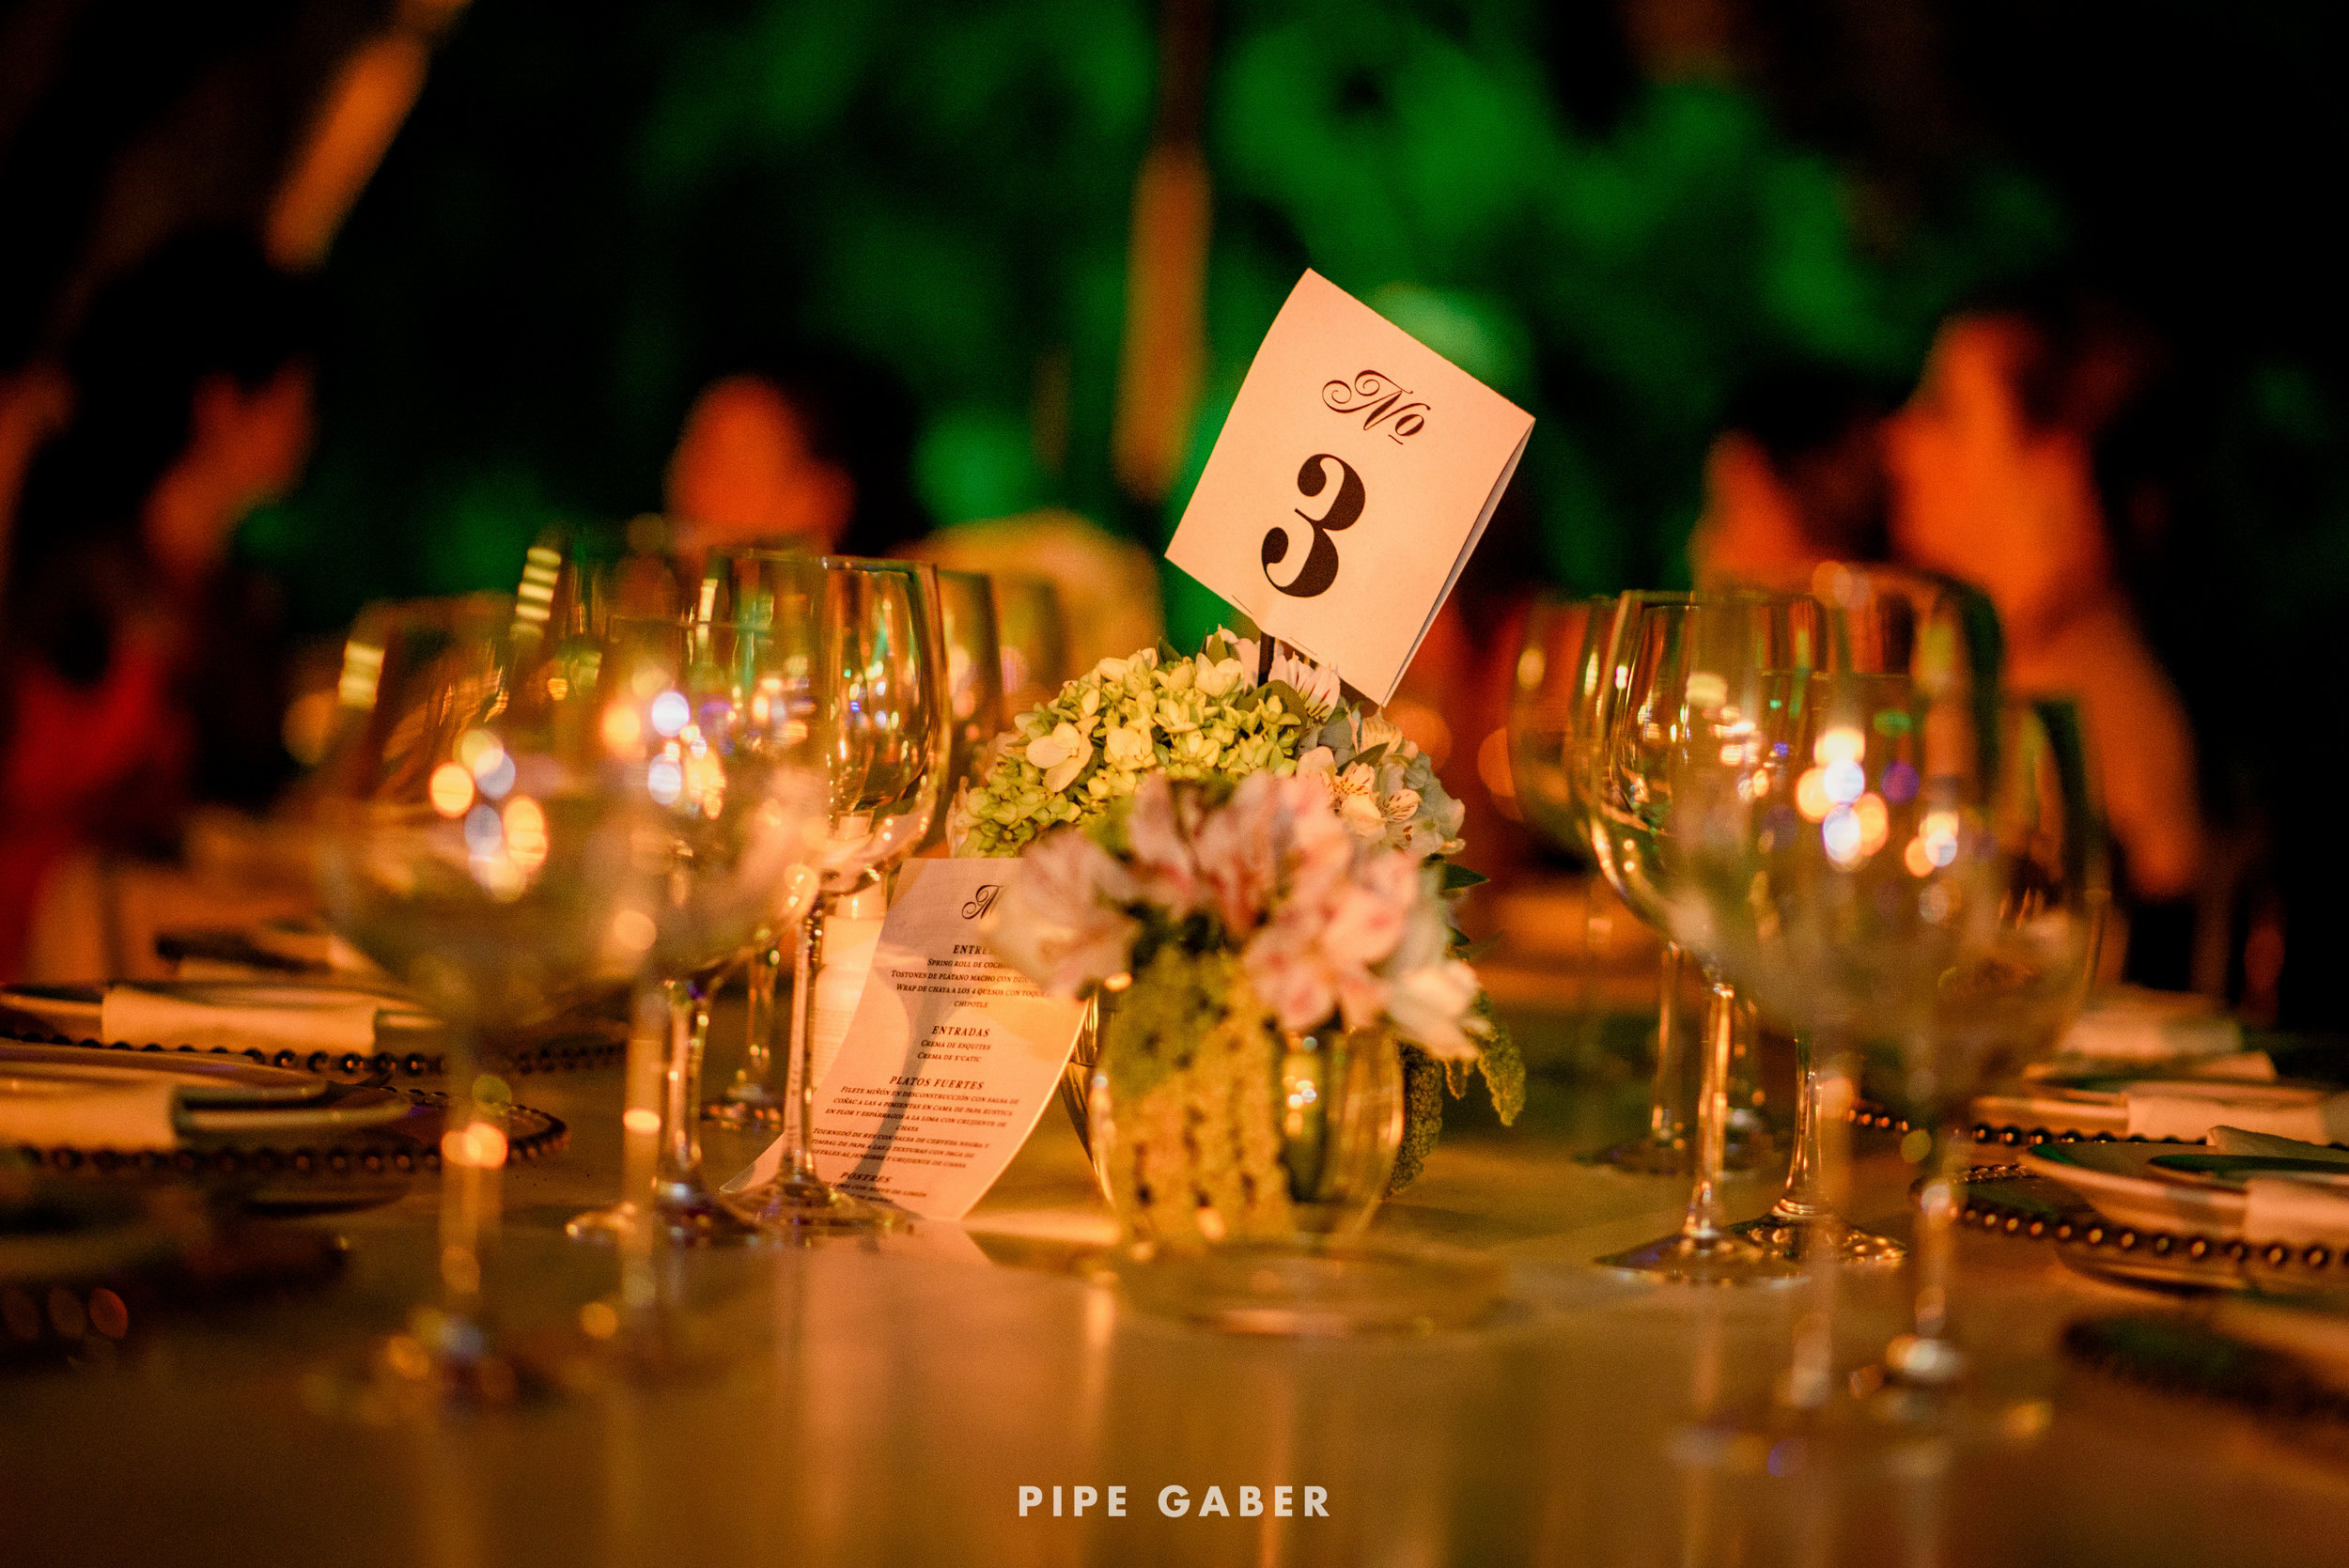 PIPE_GABER_FOTOGRAFIA_TIPS_FOR_BRIDES_COMO_ORGANIZAR_BODA_09.JPG